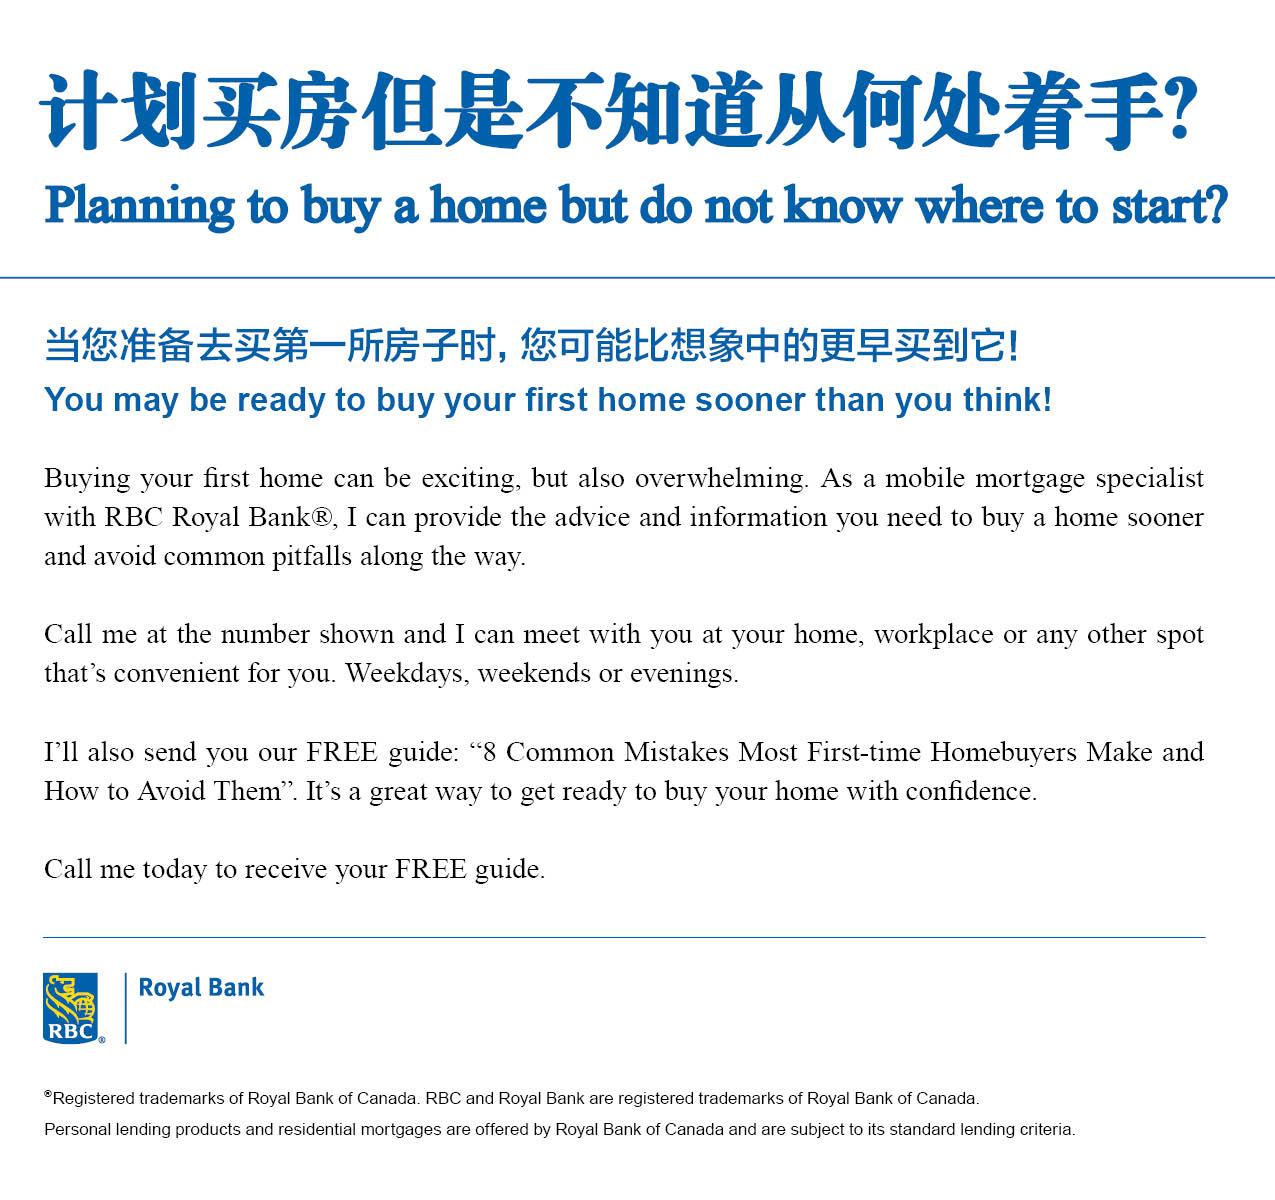 guo-hong-201800528-article-4